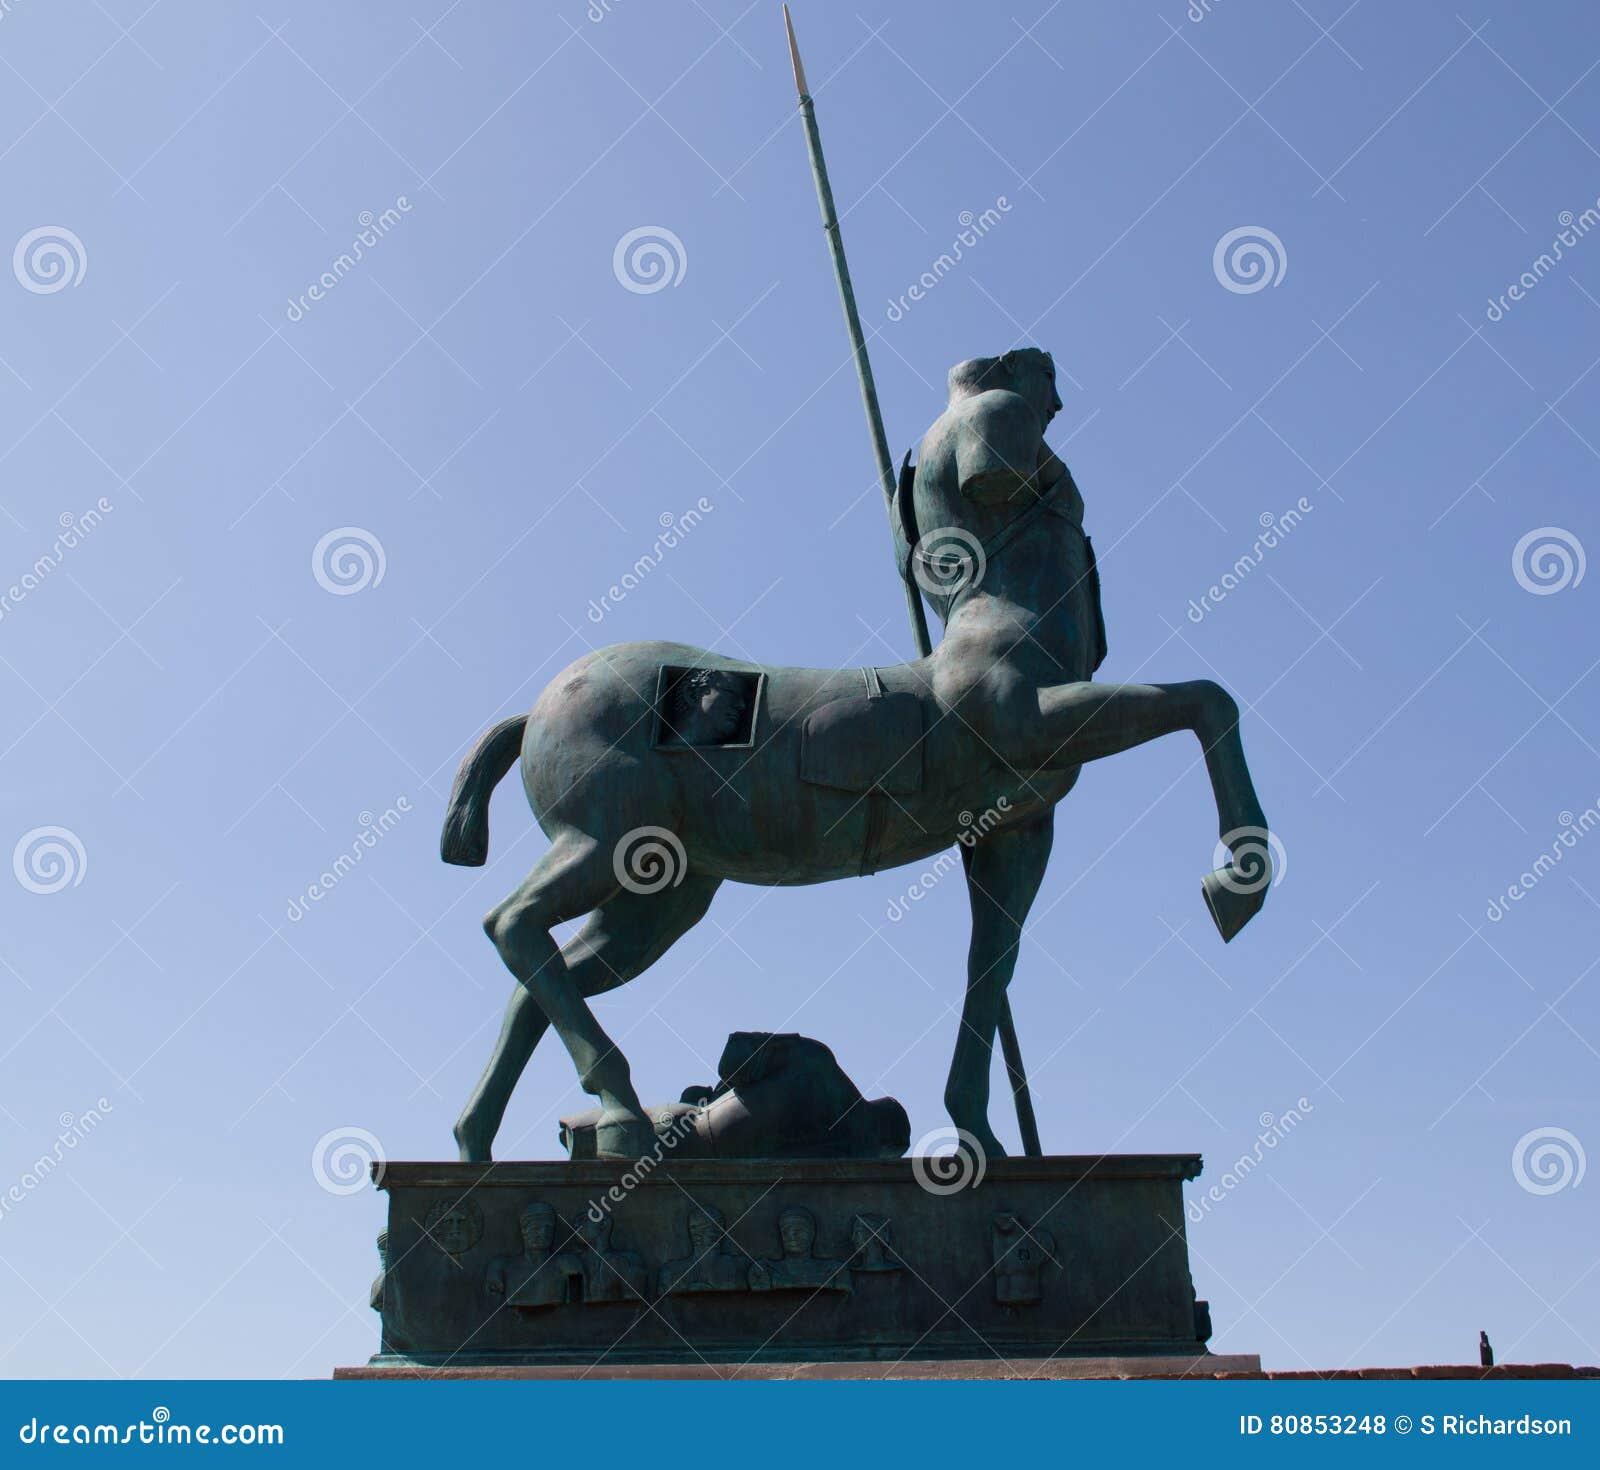 Modern Sculpture Of Centaur - Pompeii Against A Perfect Blue